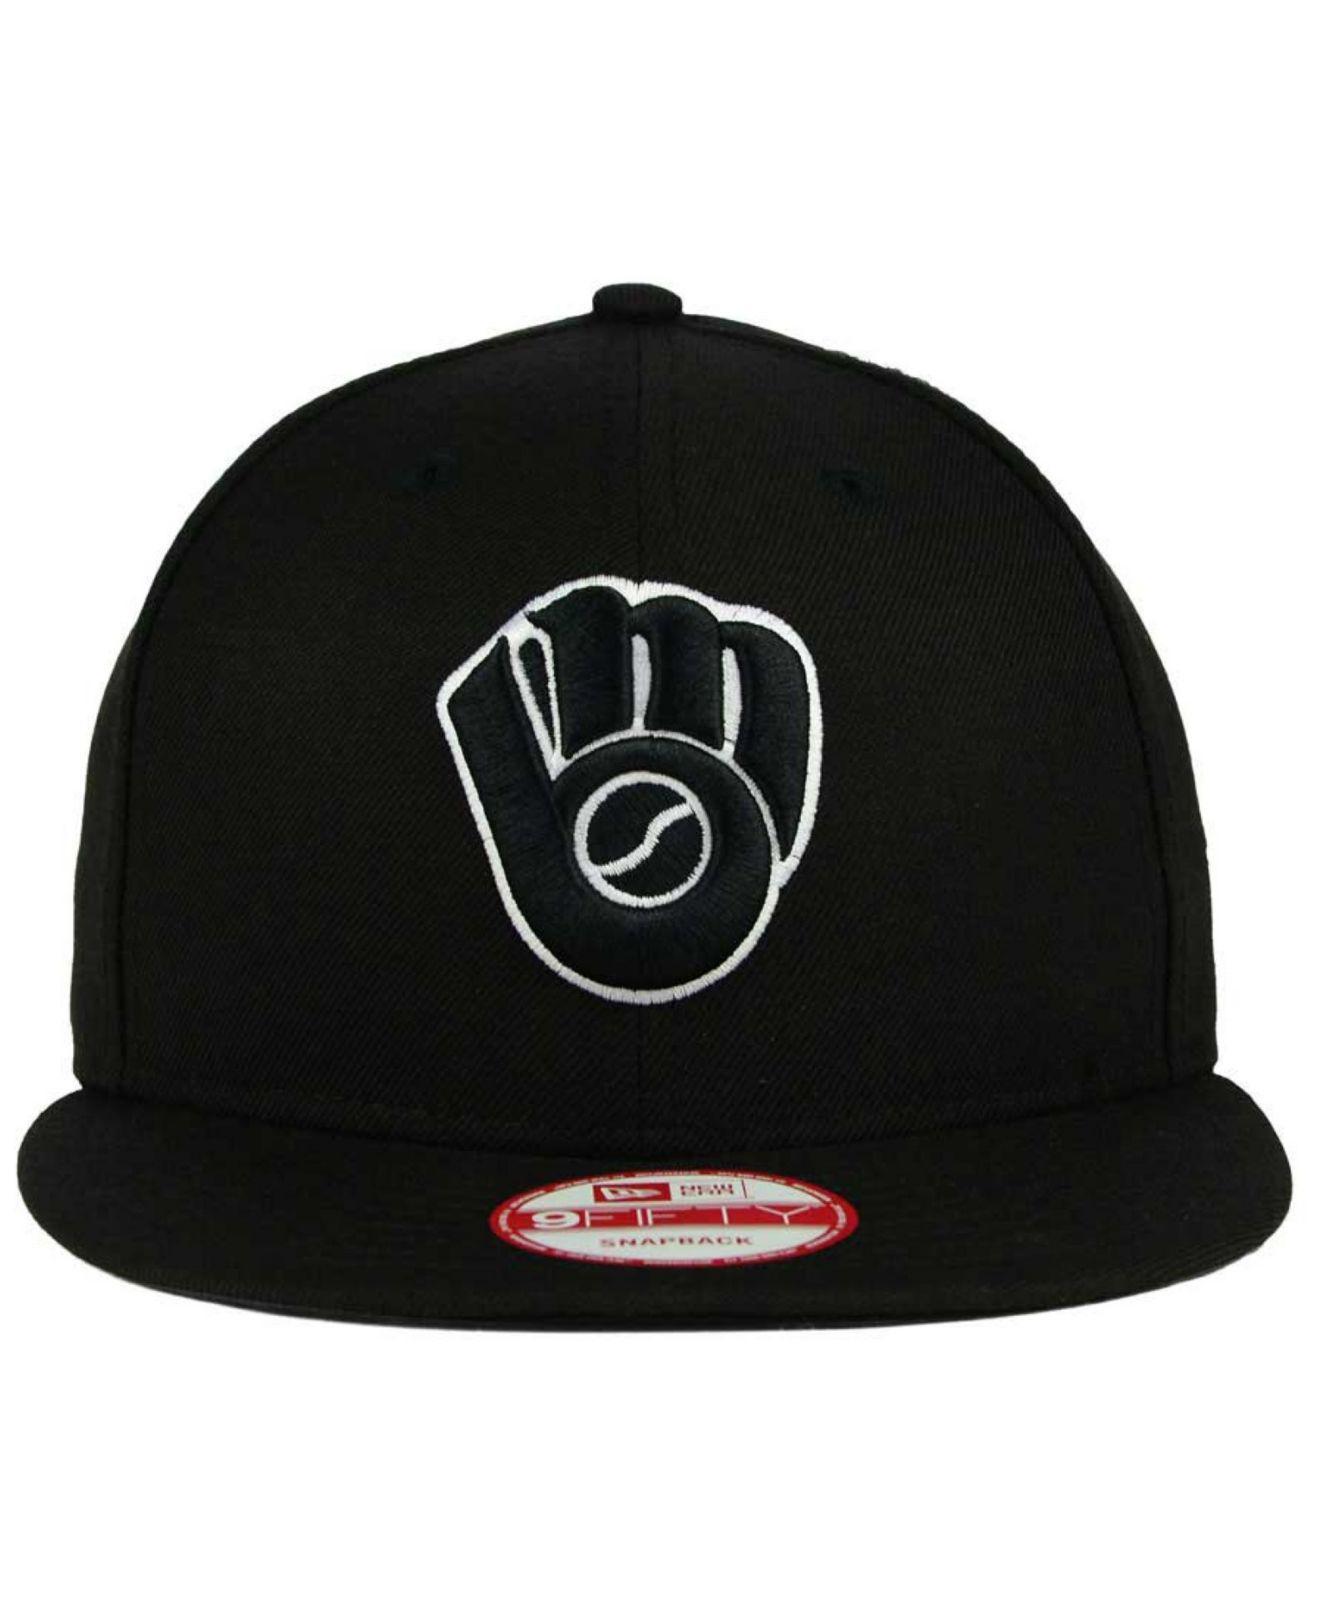 7059c138 KTZ Milwaukee Brewers B-dub 9fifty Snapback Cap in Black for Men - Lyst